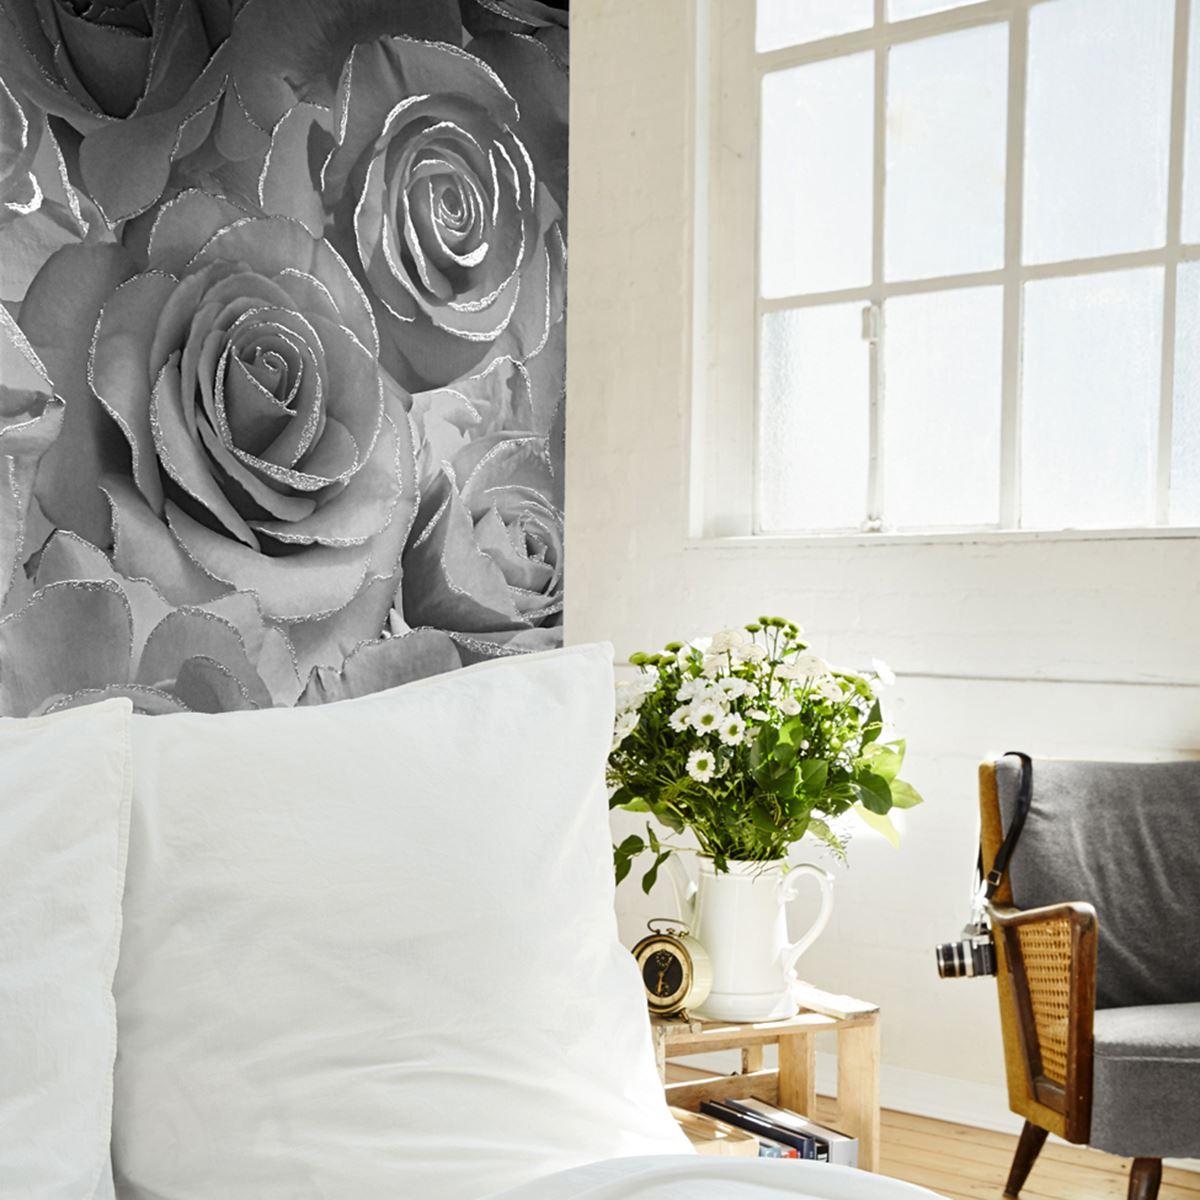 Muriva Madison Rose Glitzer Blumenmuster Luxus Tapete Silbergrau